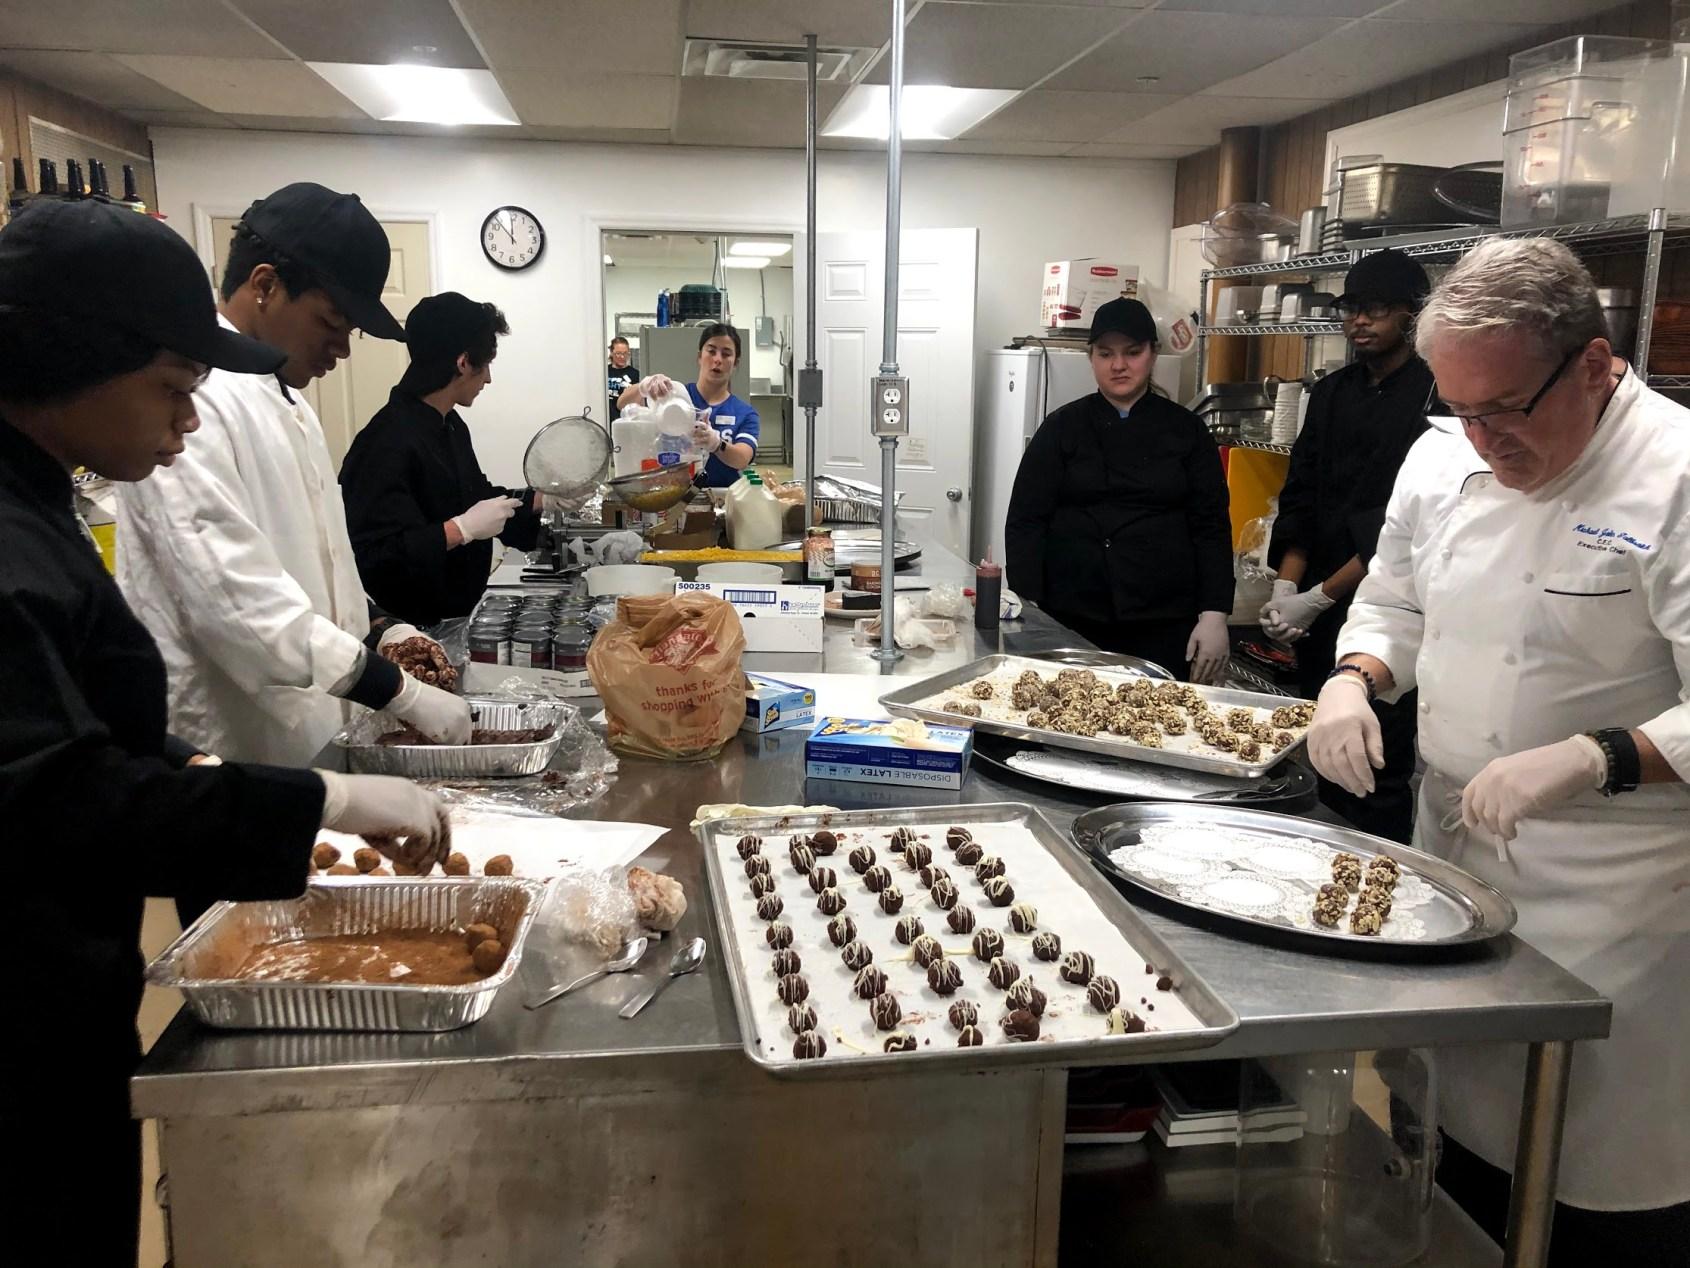 SEAT Center - Culinary Program